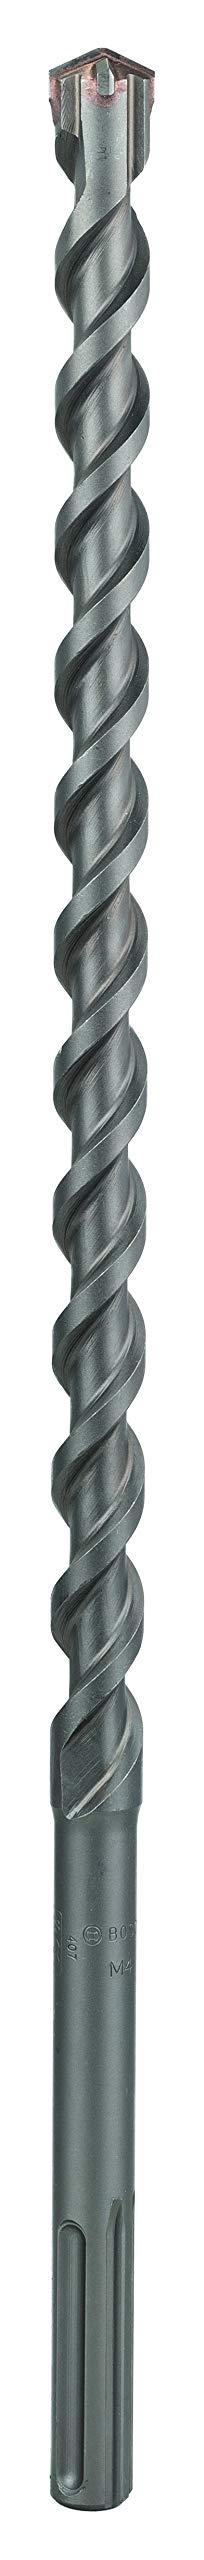 "Hawera M45015 7/8"" X 21"" SDS-max Carbide Rotary Hammer Drill Bit for Concrete"